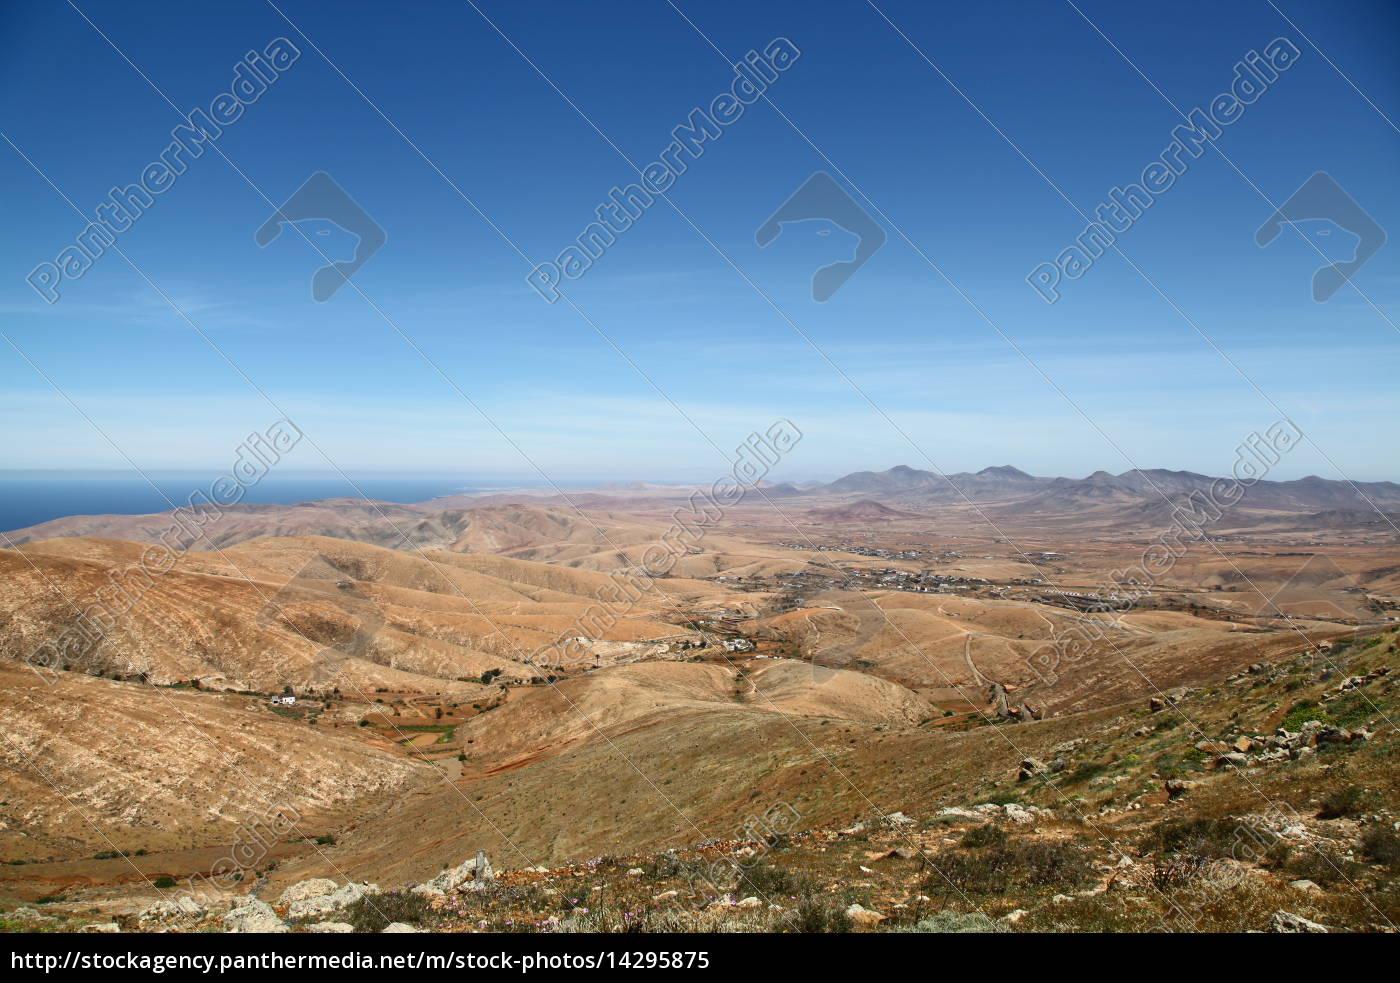 góra, anhöhe, wzgórze, góry, kanarek, krajobraz - 14295875